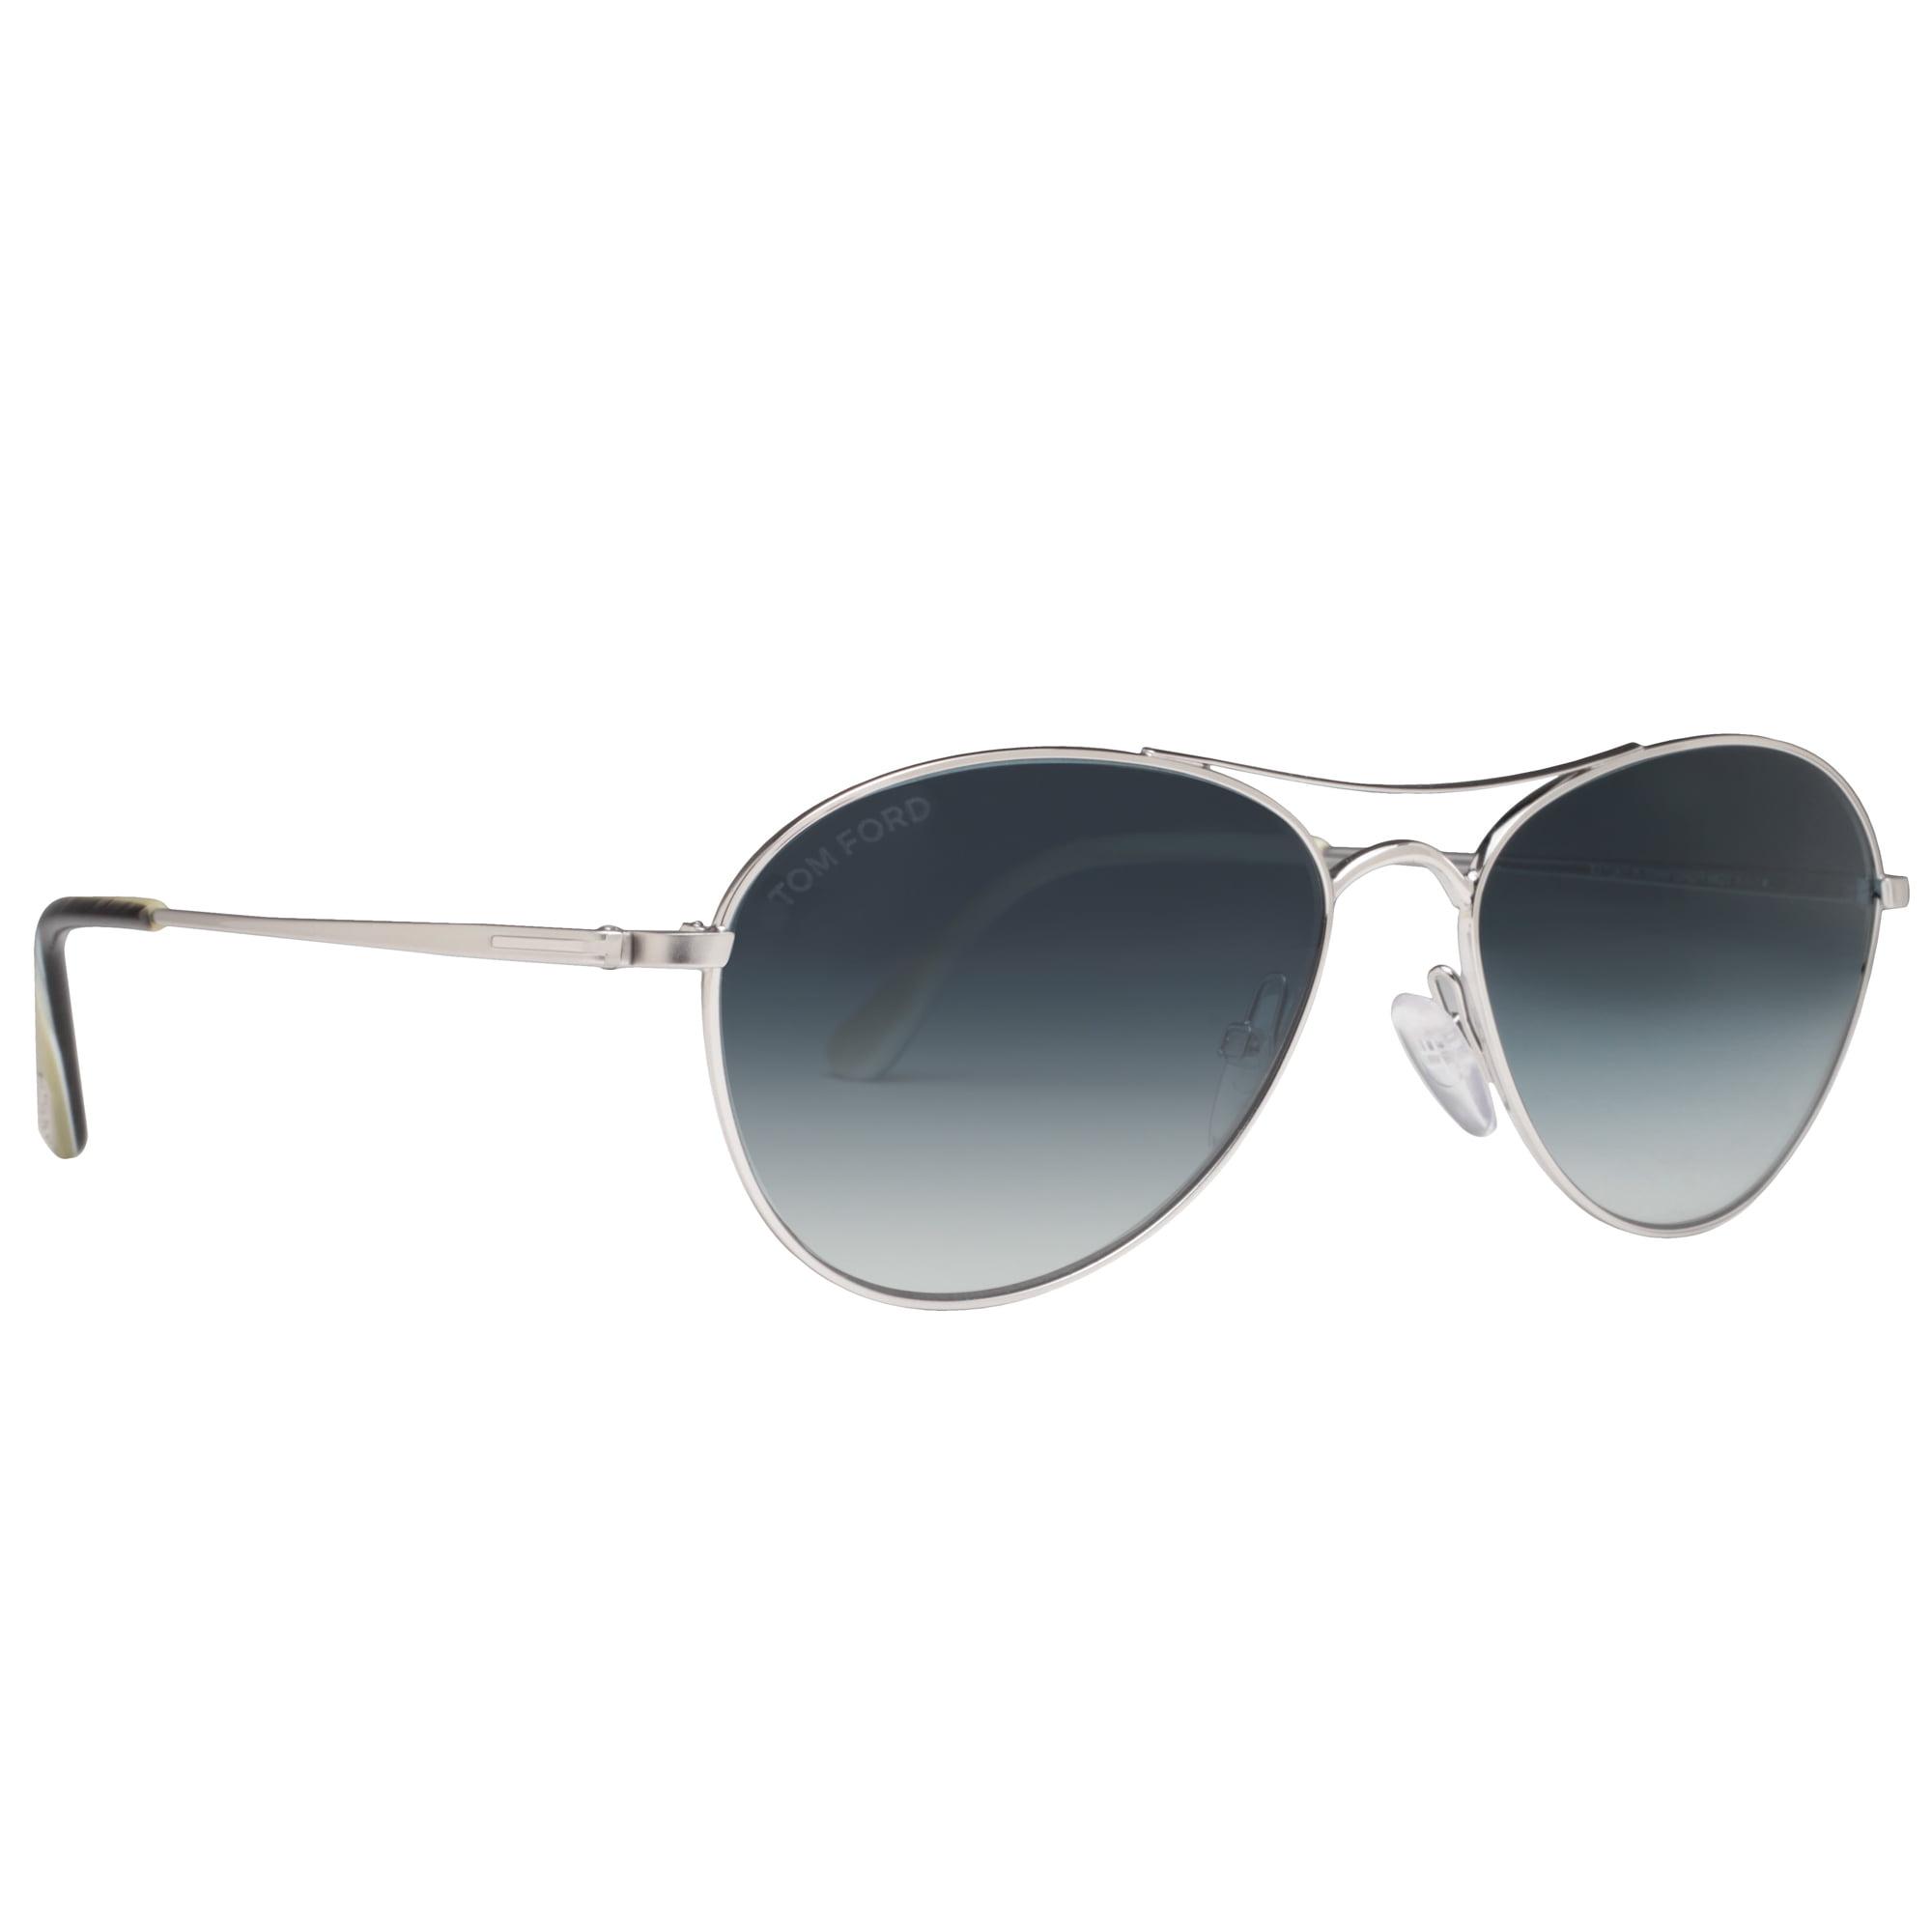 21f4eeeb06c TOM FORD - Tom Ford Oliver TF 495 18W 56mm Shiny Rhodium Blue Gradient  Aviator Sunglasses - Walmart.com